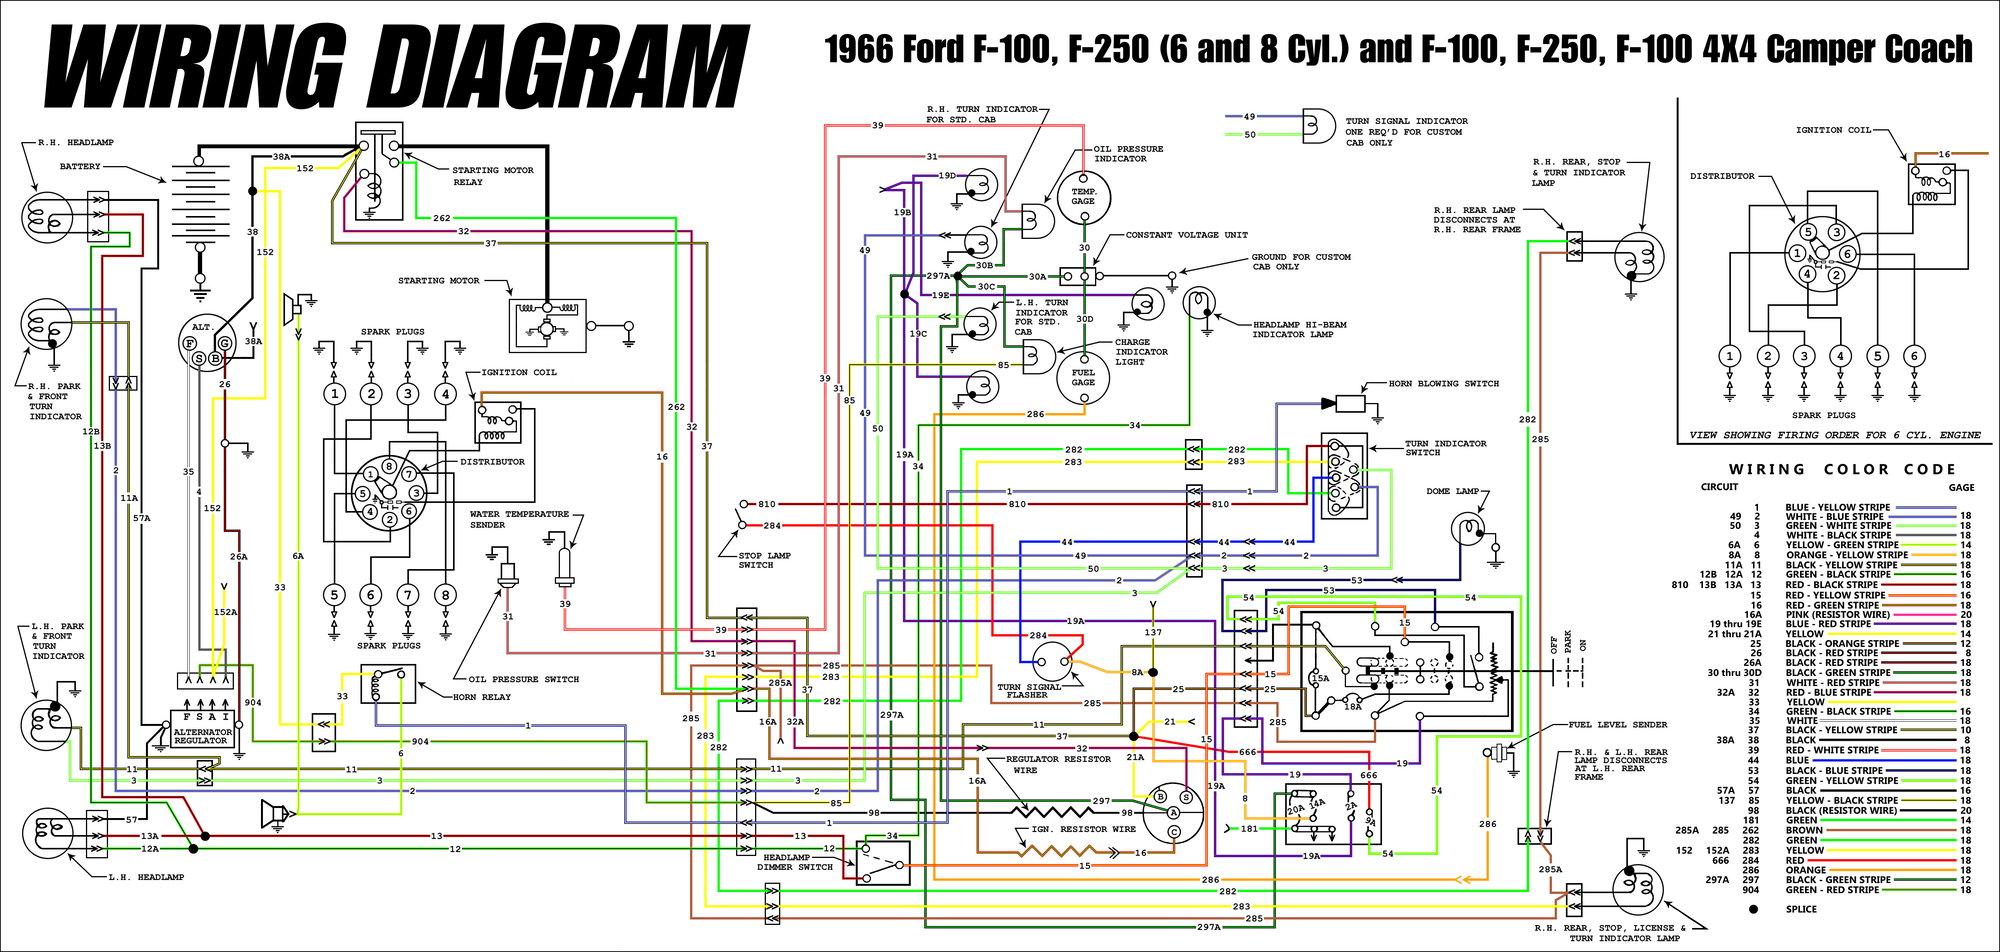 [QMVU_8575]  Fuse Box Wiring Diagram - Ford Truck Enthusiasts Forums | 1966 Ford Fuse Box |  | Ford Truck Enthusiasts